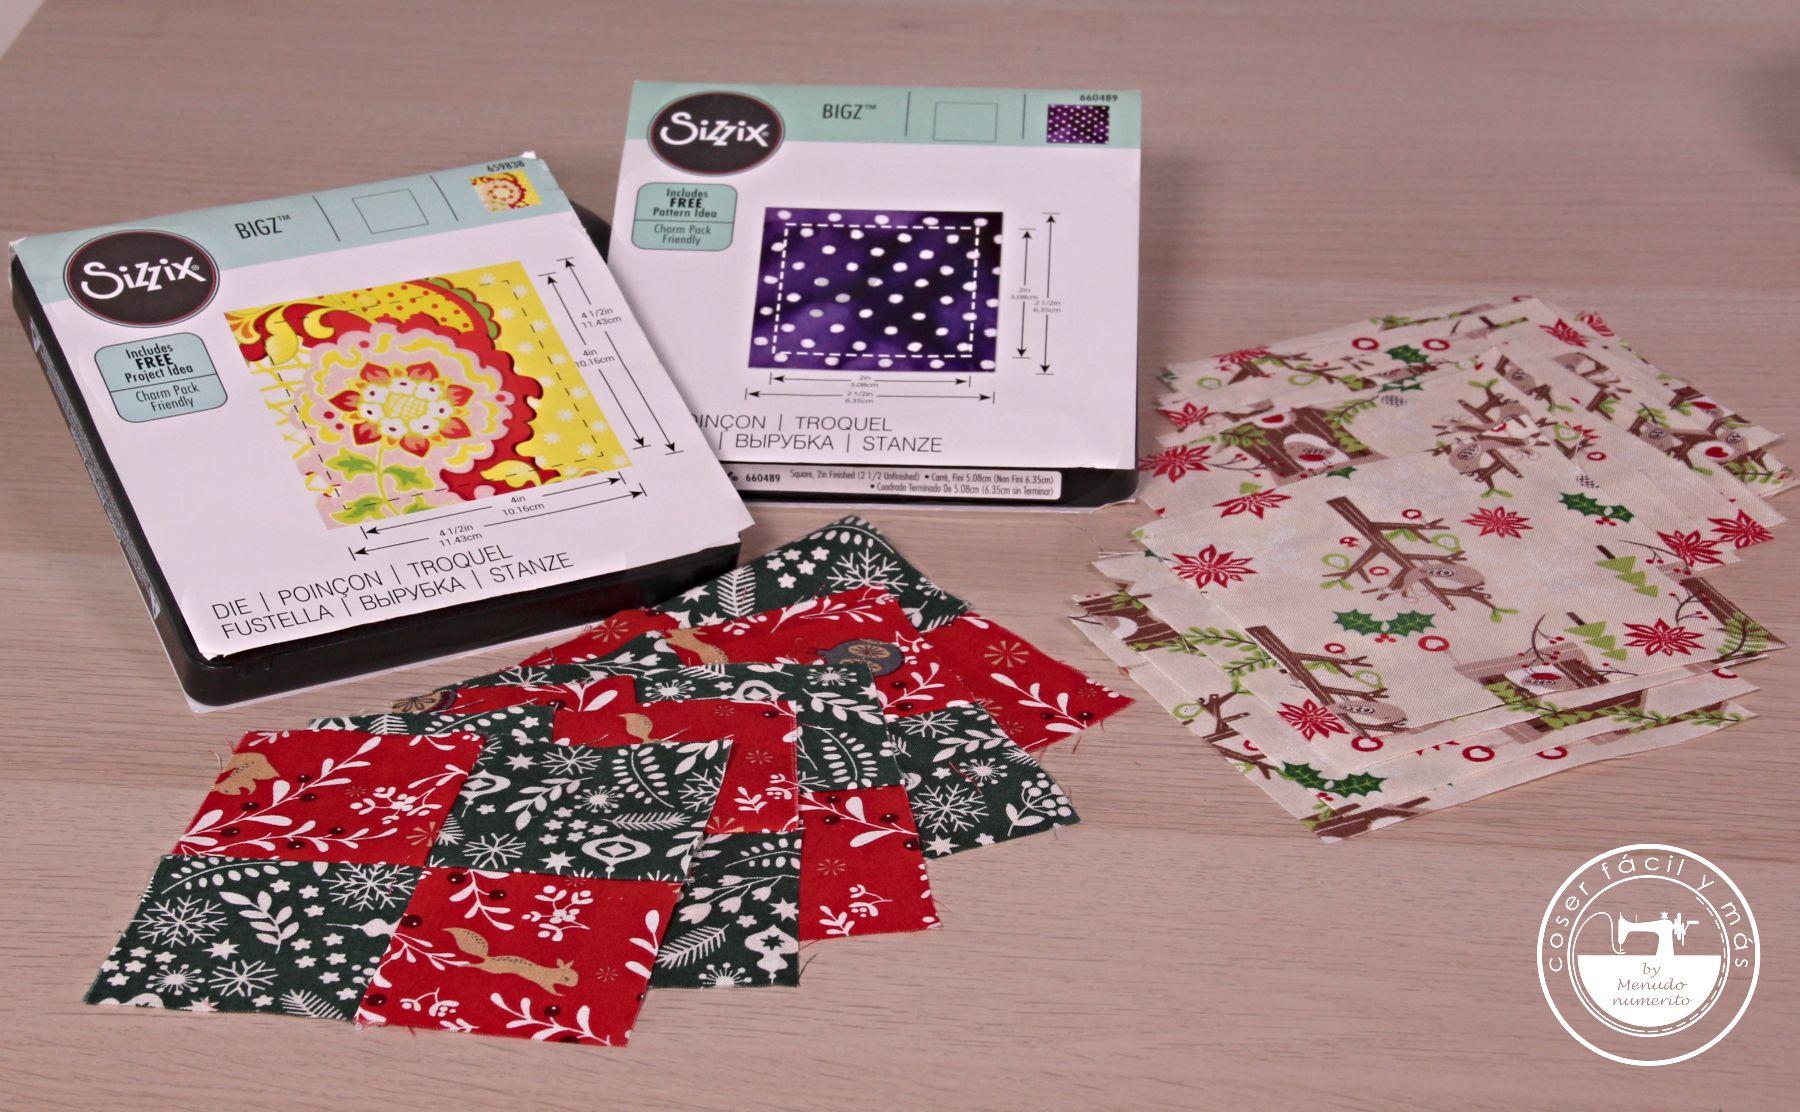 camino de mesa navidad coser facil blogs de costura